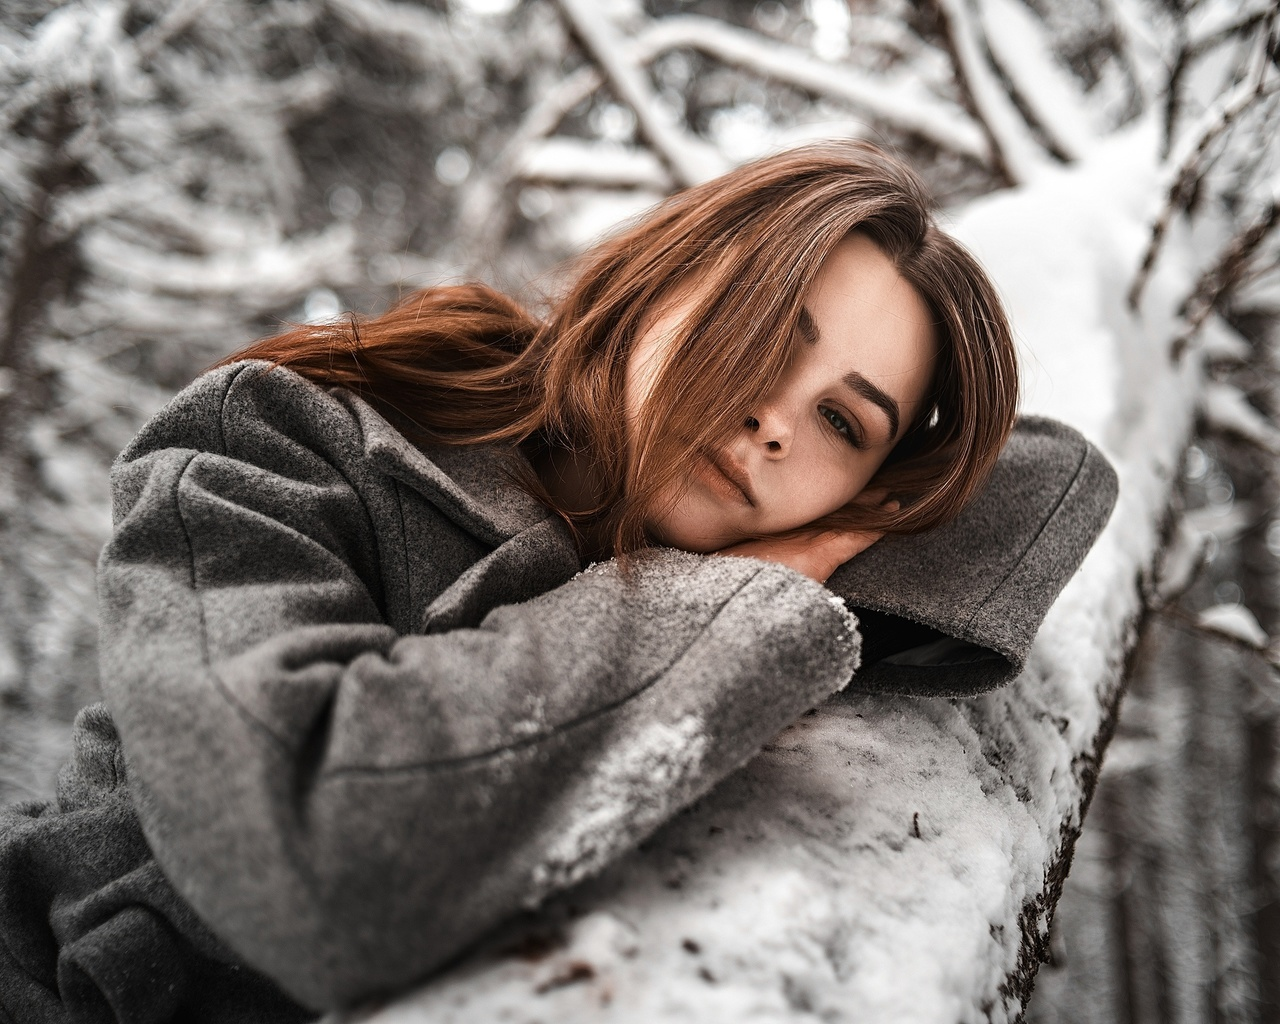 women, portrait, hair in face, coats, trees, snow, winter, women outdoors